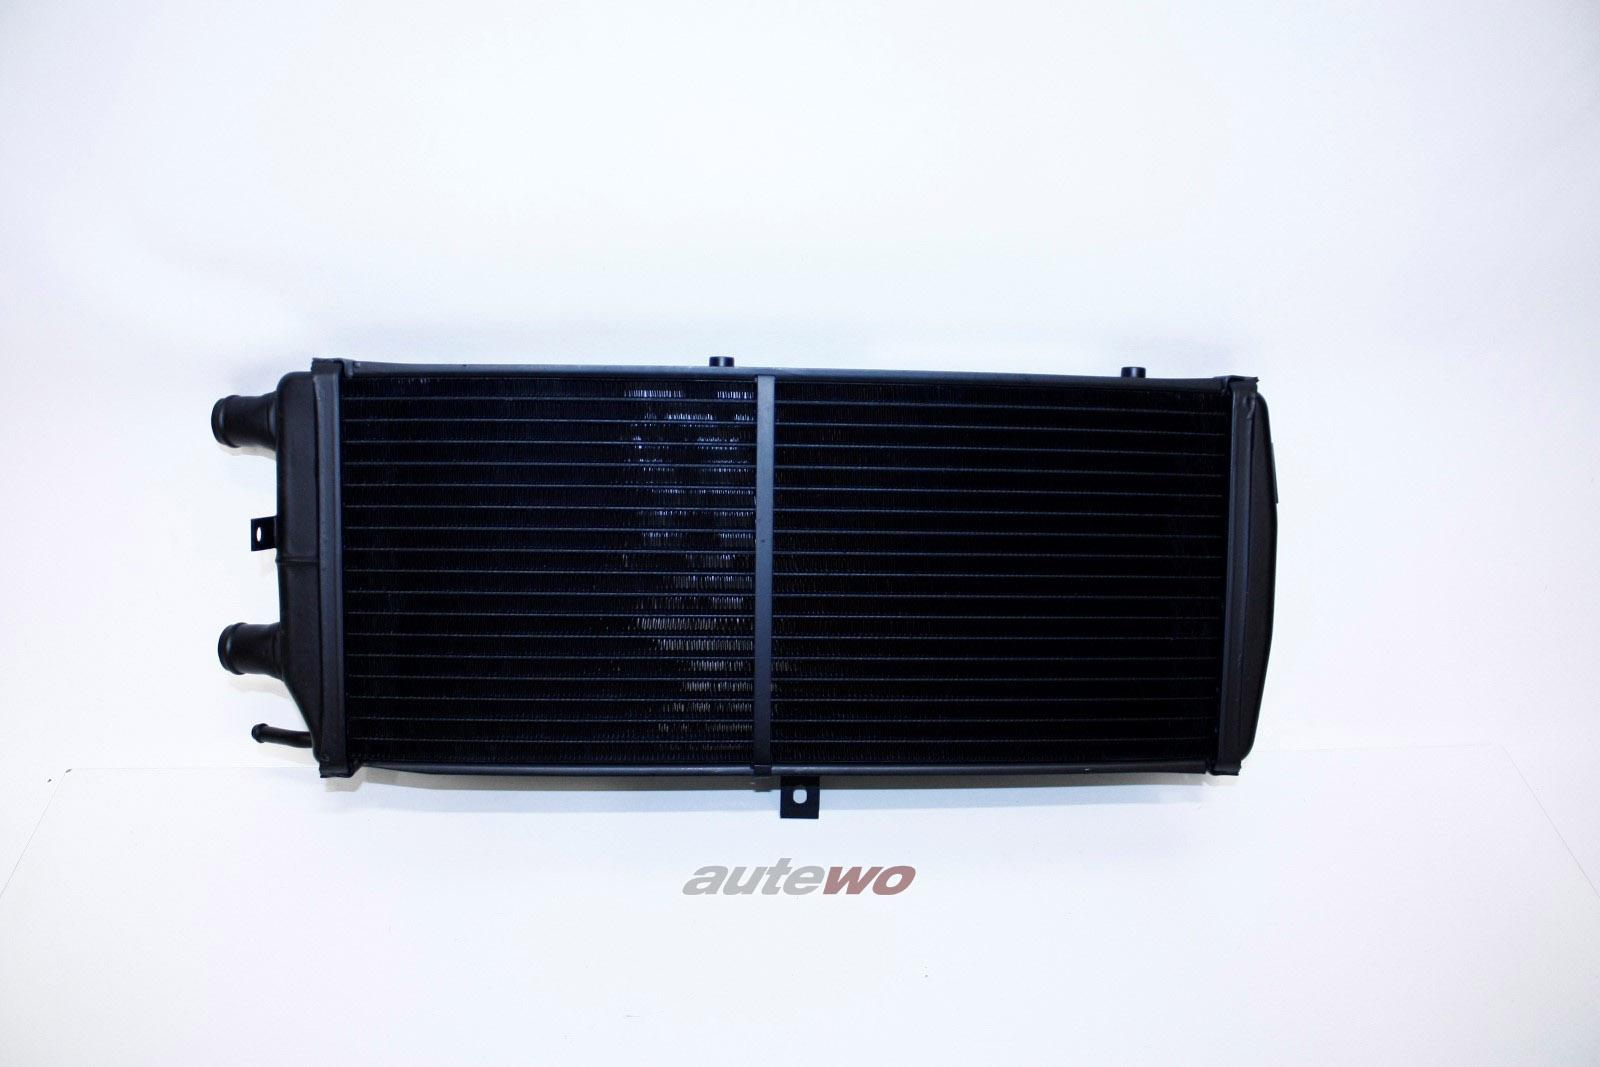 857121251D NEU Audi Urquattro 20V 2.2.l Zusatzwasserkühler